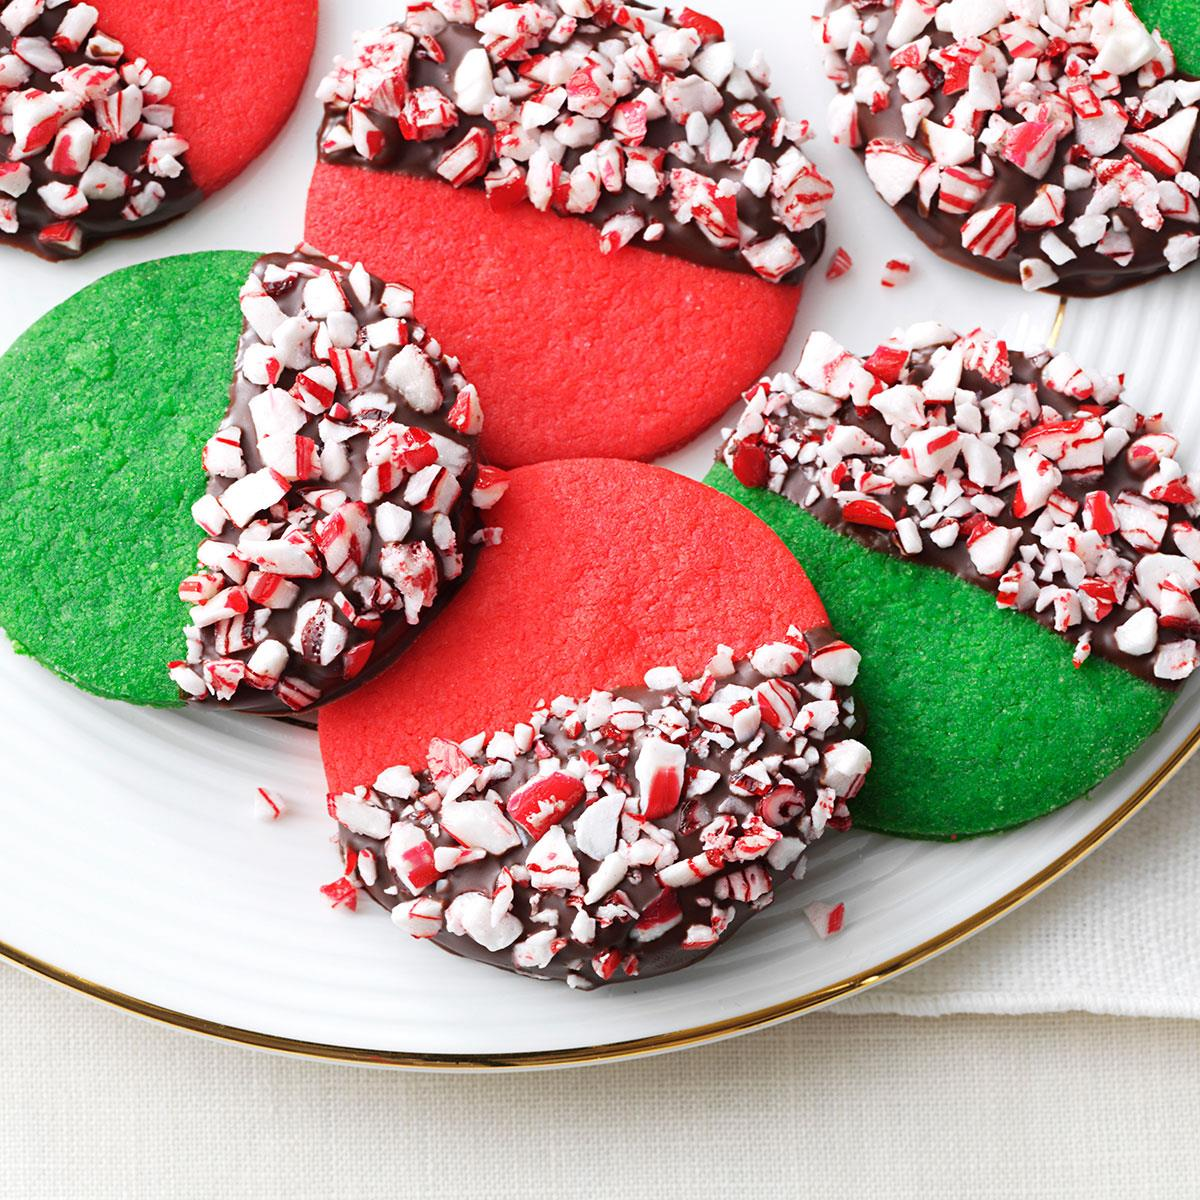 Peppermint Crunch Christmas Cookies Recipe